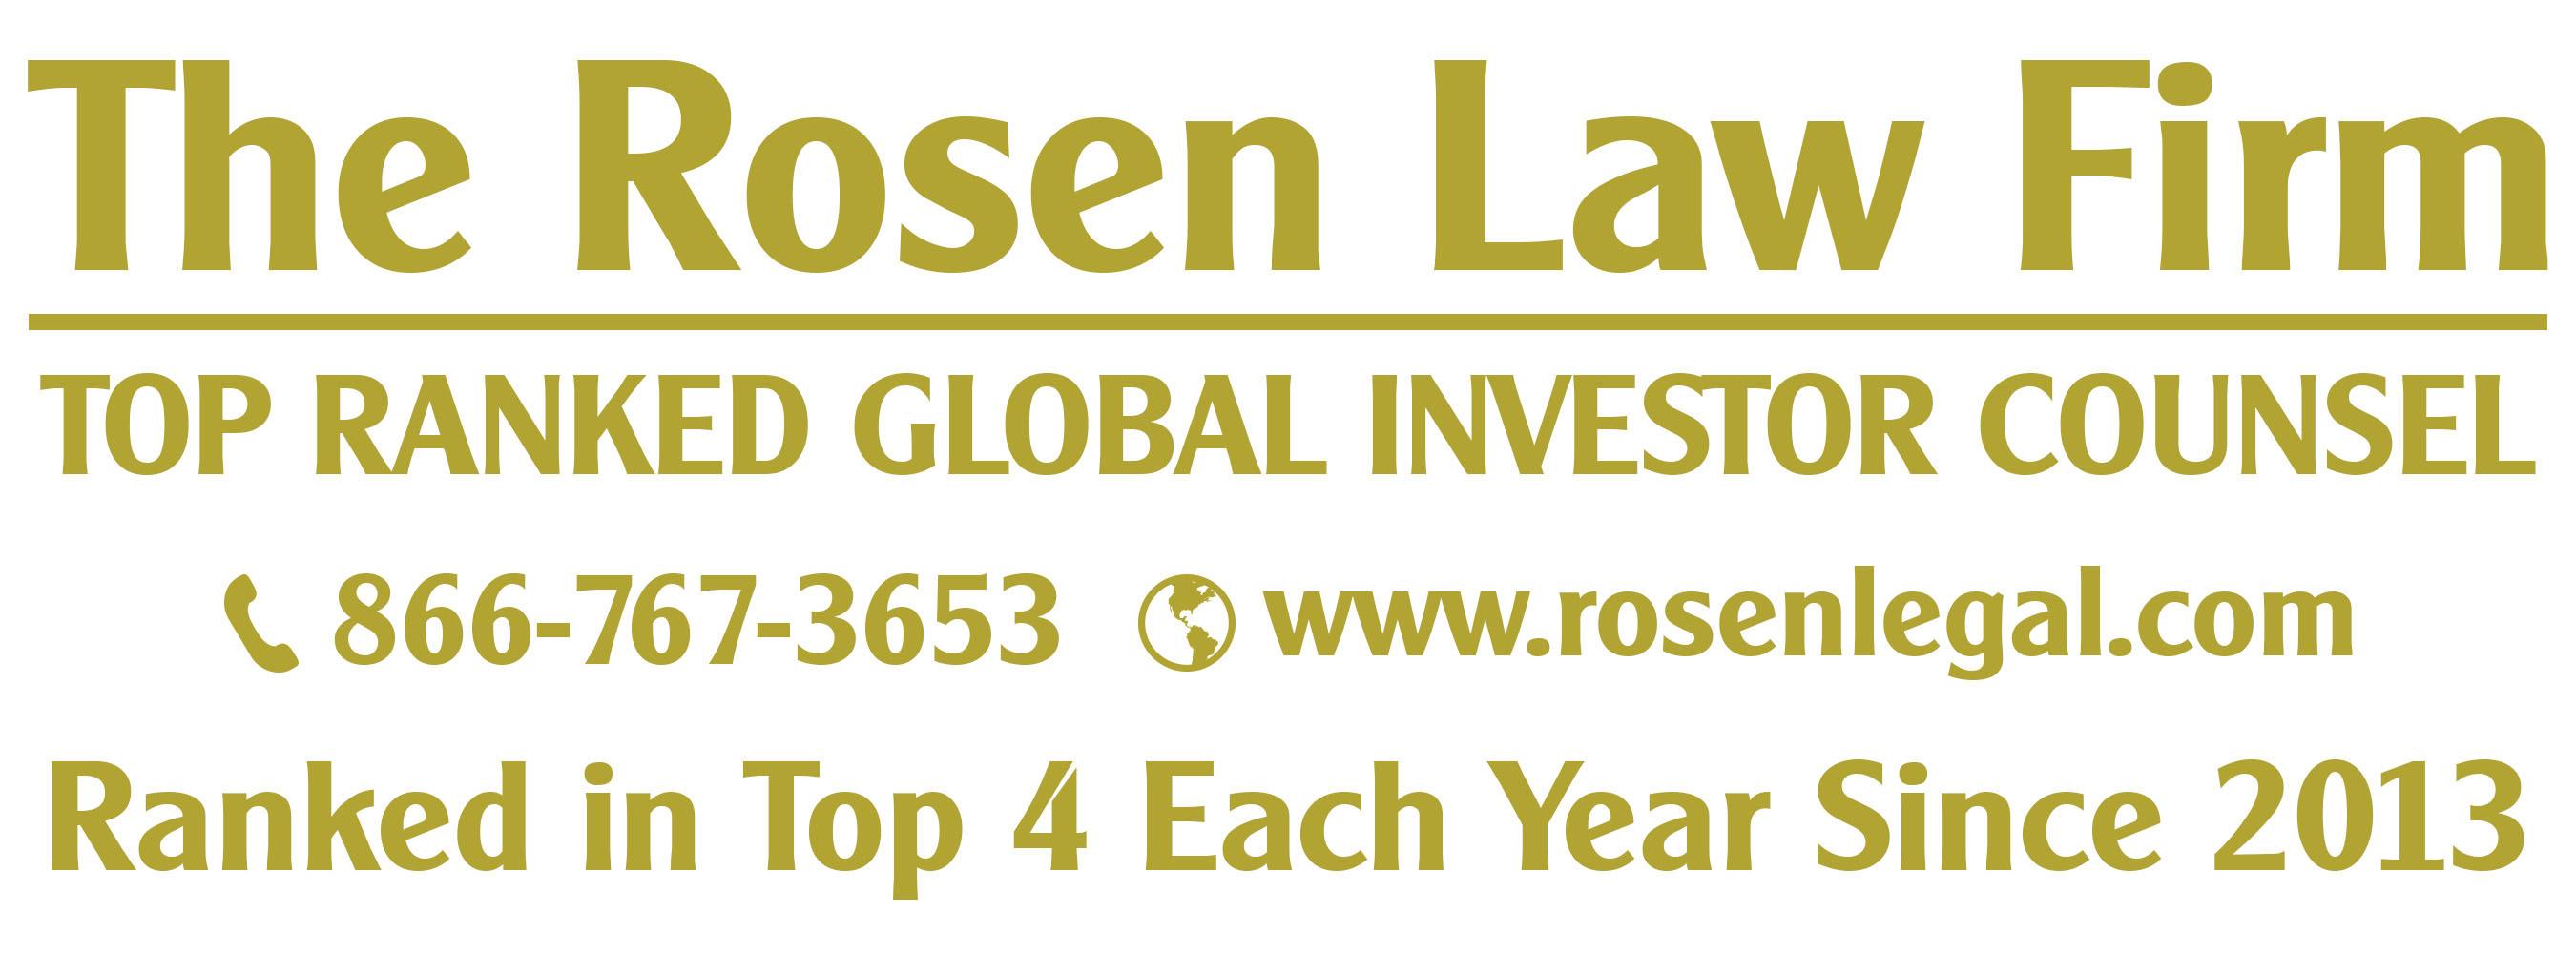 EQUITY ALERT: Rosen Law Firm Announces Filing of Securities Class Action Lawsuit Against Bridgepoint Education, Inc. - BPI